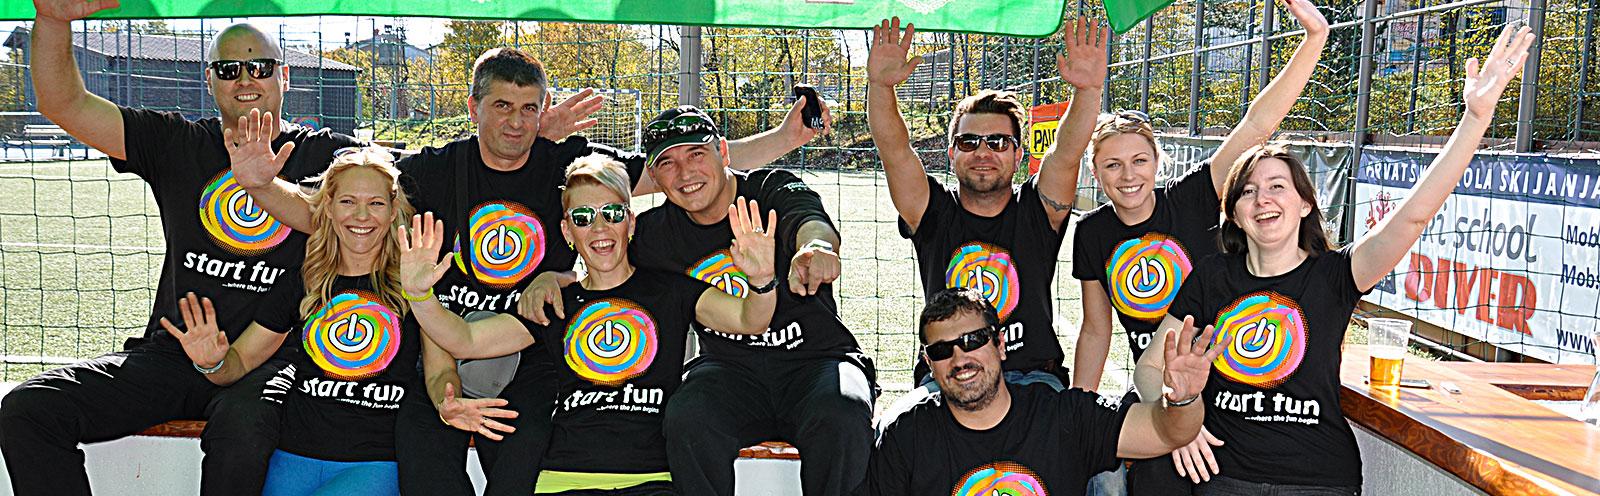 start-fun-team-banner